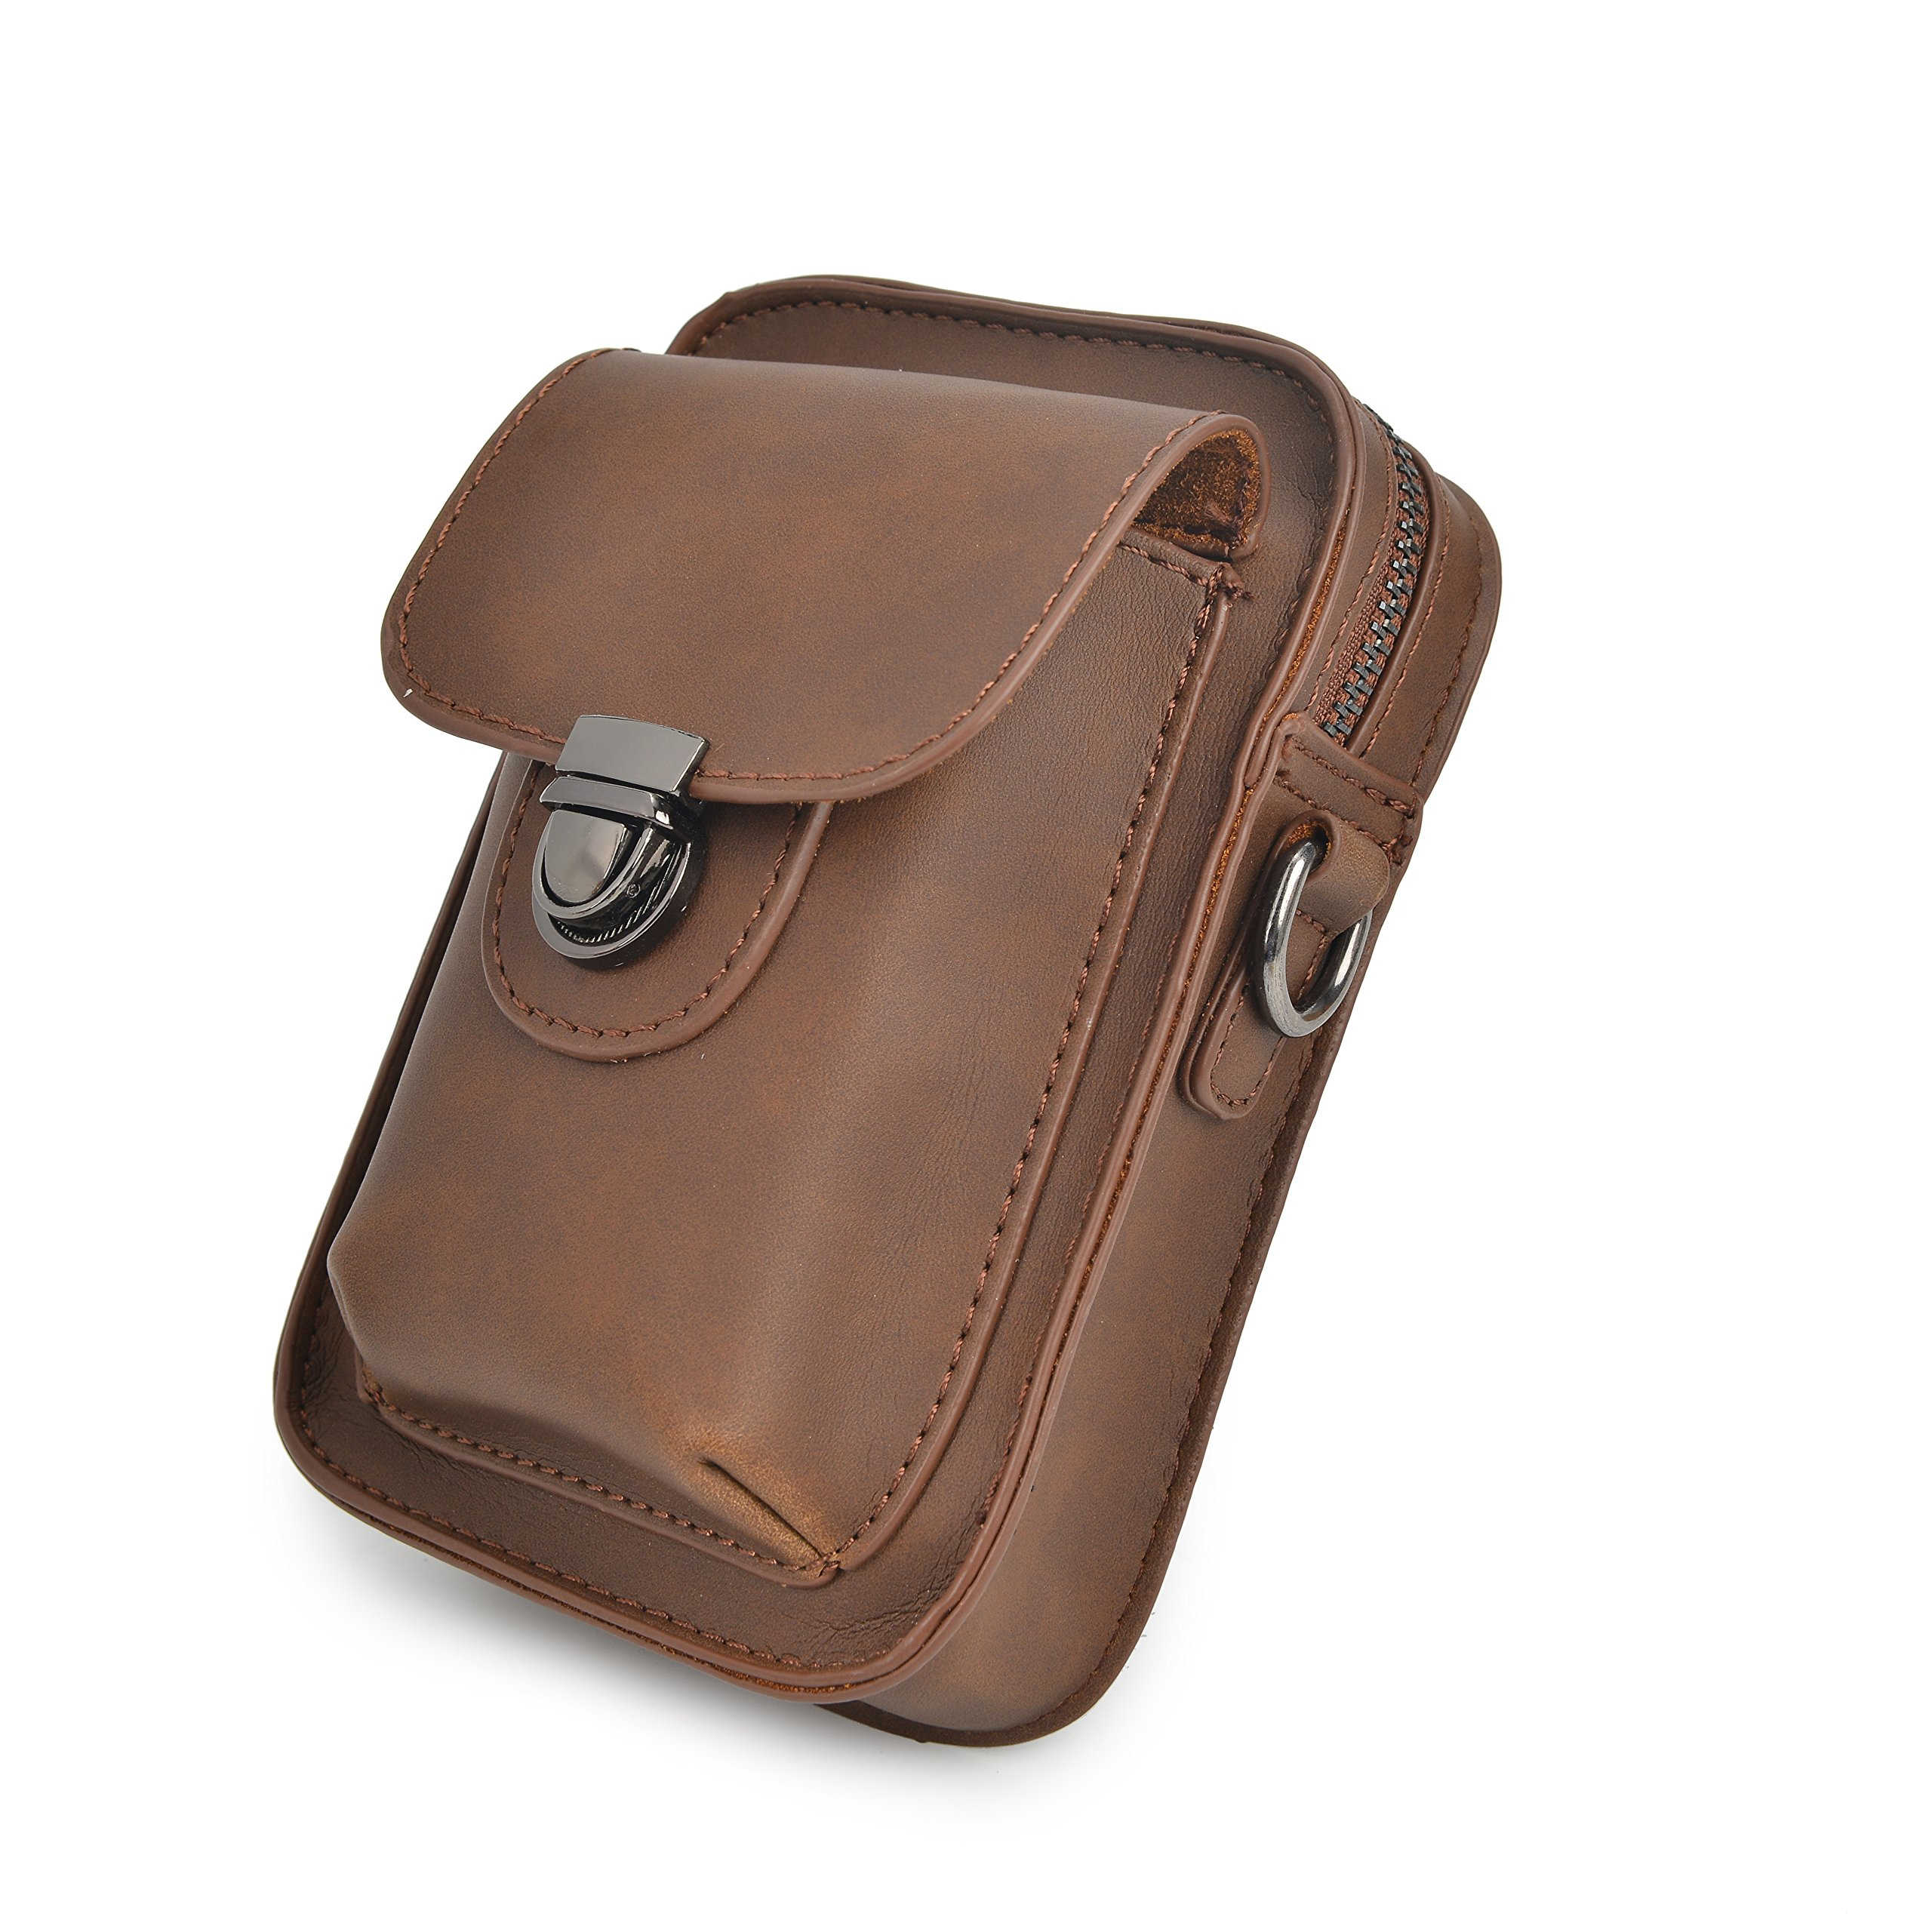 Mens PU Leather Waist Bag Messenger Shoulder Satchel Small Hook Waist Belt Bag Cigarette Phone Case Pouch